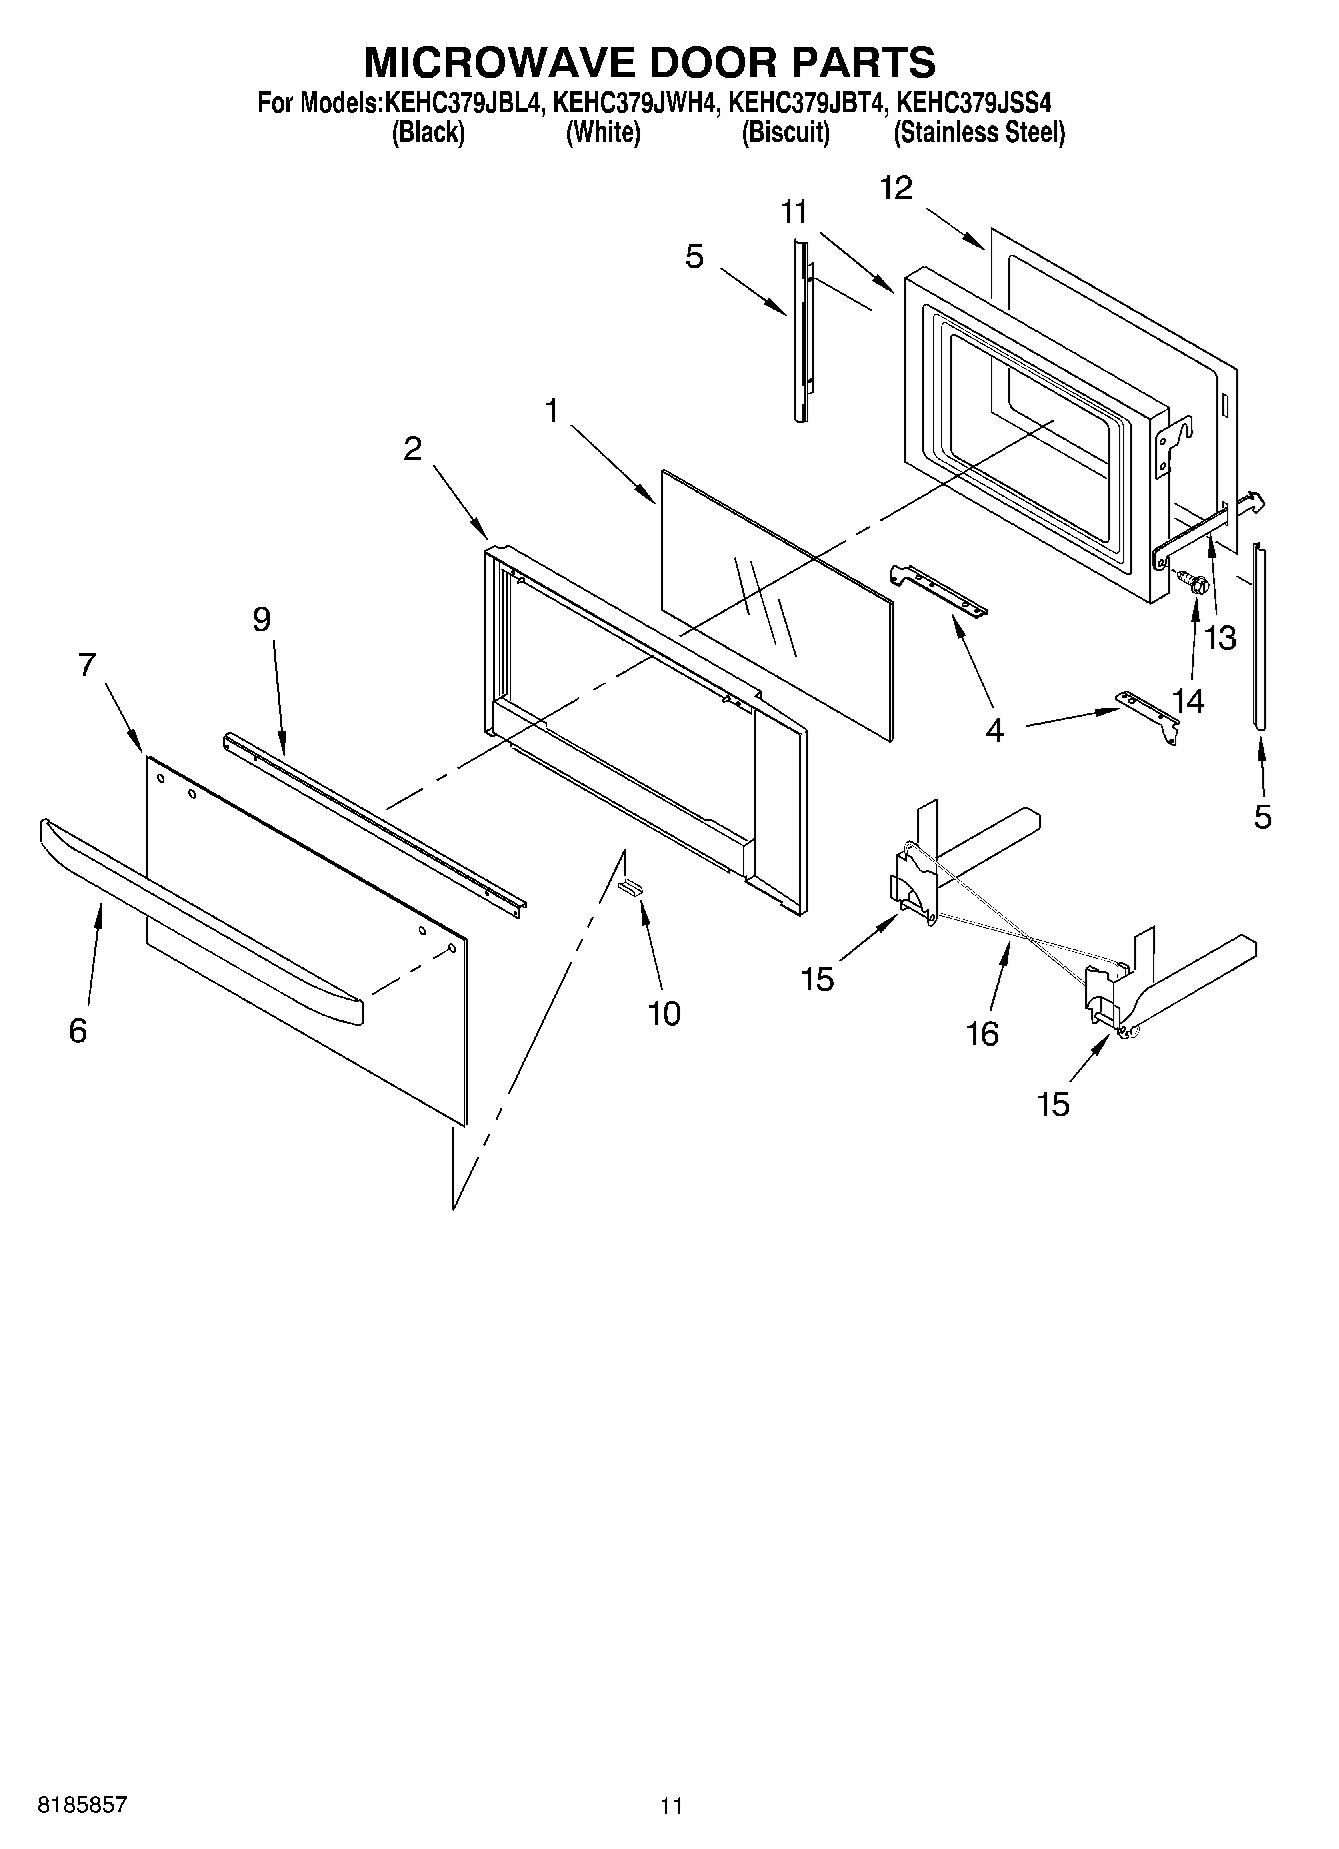 kehc379jss4 microwave door built in oven electric. Black Bedroom Furniture Sets. Home Design Ideas